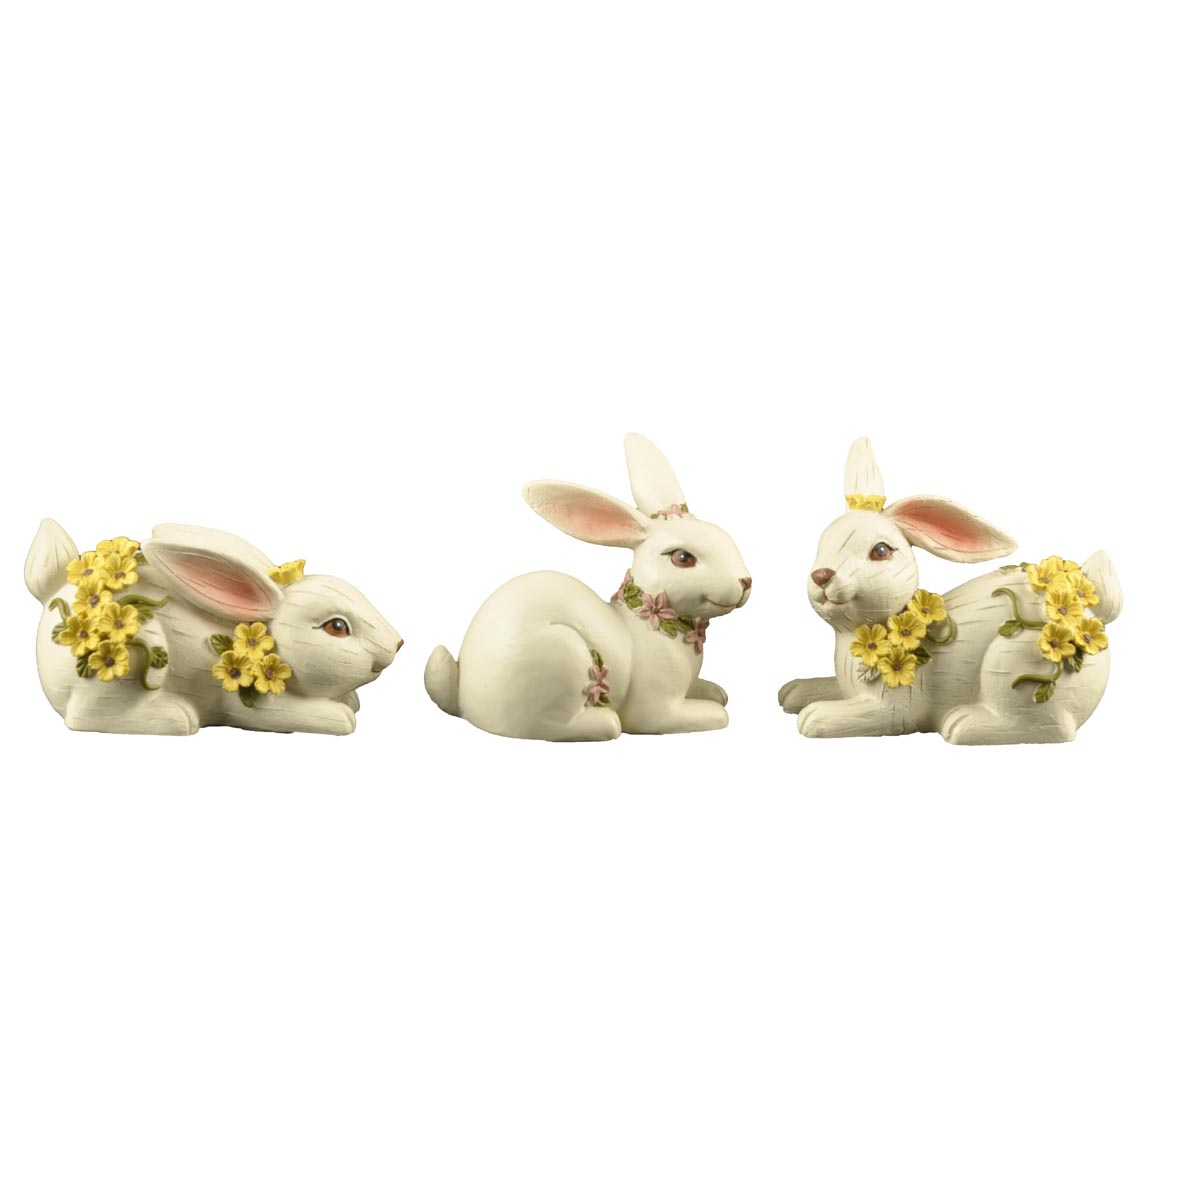 Ennas easter rabbit decor polyresin micro landscape-1